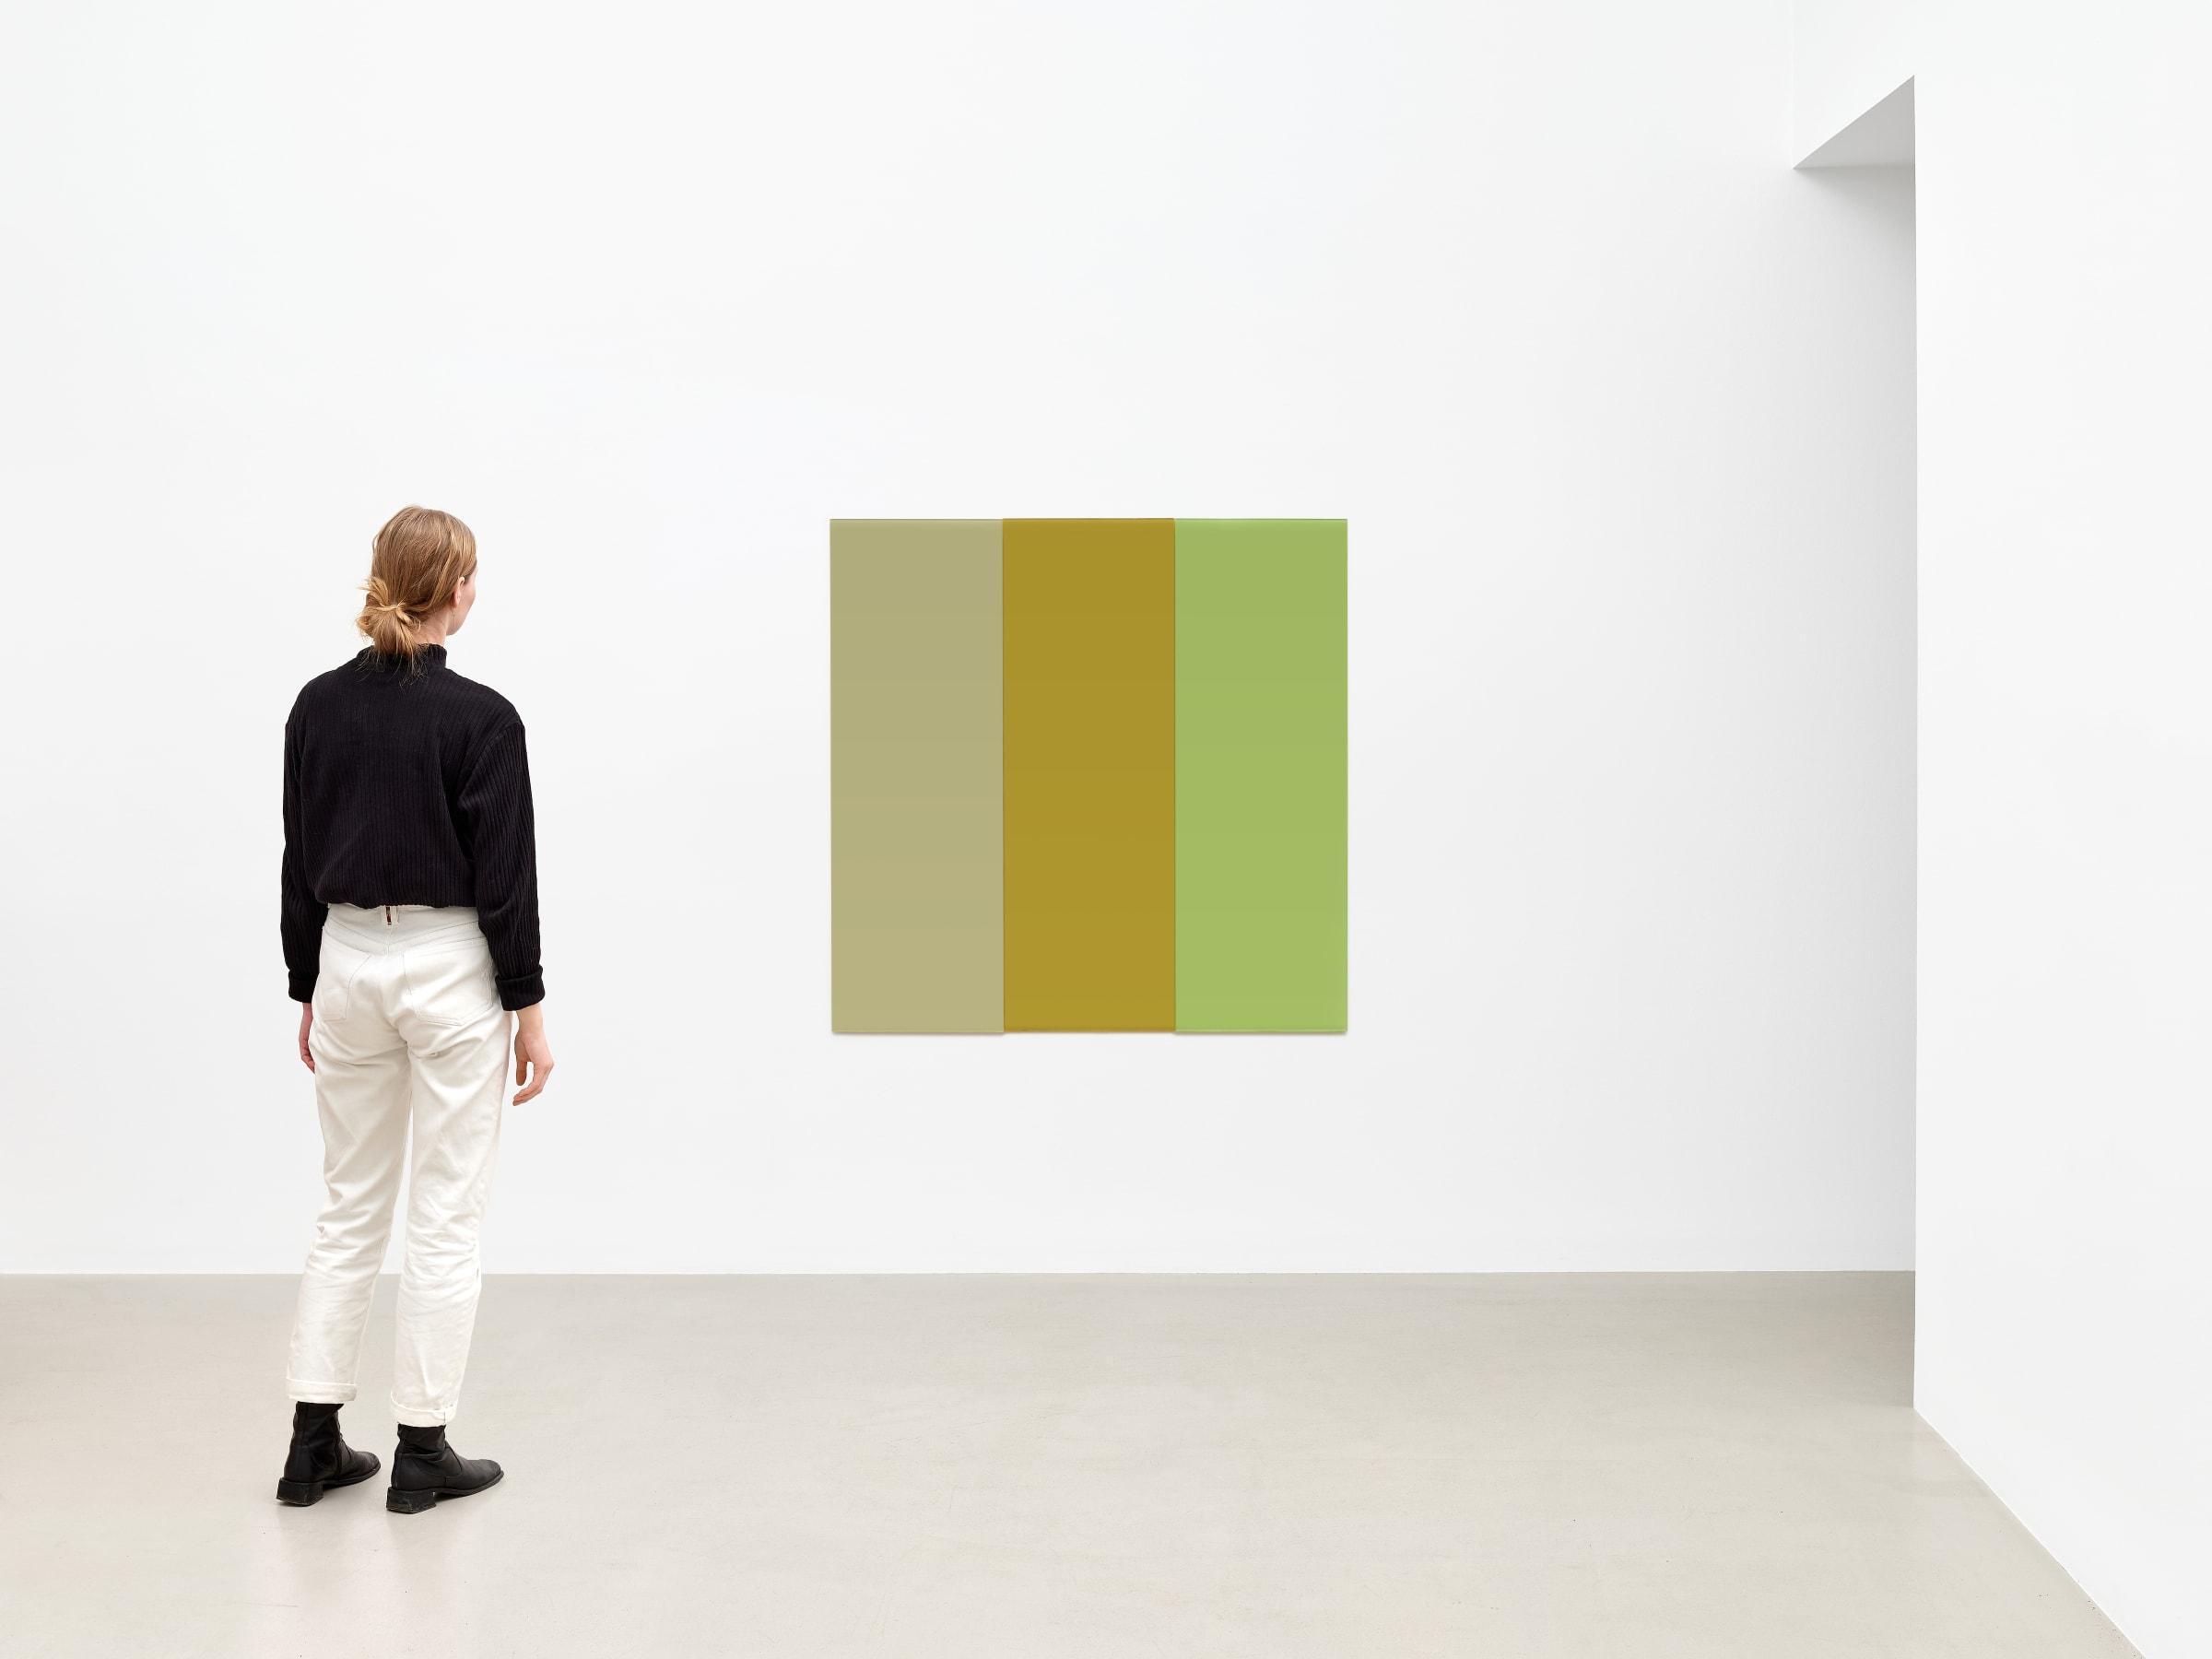 "<span class=""link fancybox-details-link""><a href=""/artists/43-or-vigfusson/works/3820/"">View Detail Page</a></span><div class=""artist""><strong>ÞÓR VIGFÚSSON</strong></div> <div class=""title""><em>Untitled</em>, 2003</div> <div class=""medium"">enameled glass</div> <div class=""dimensions"">Each panel:<br /> 59 1/8 x 19 3/4 in<br /> 150 x 50 cm</div>"